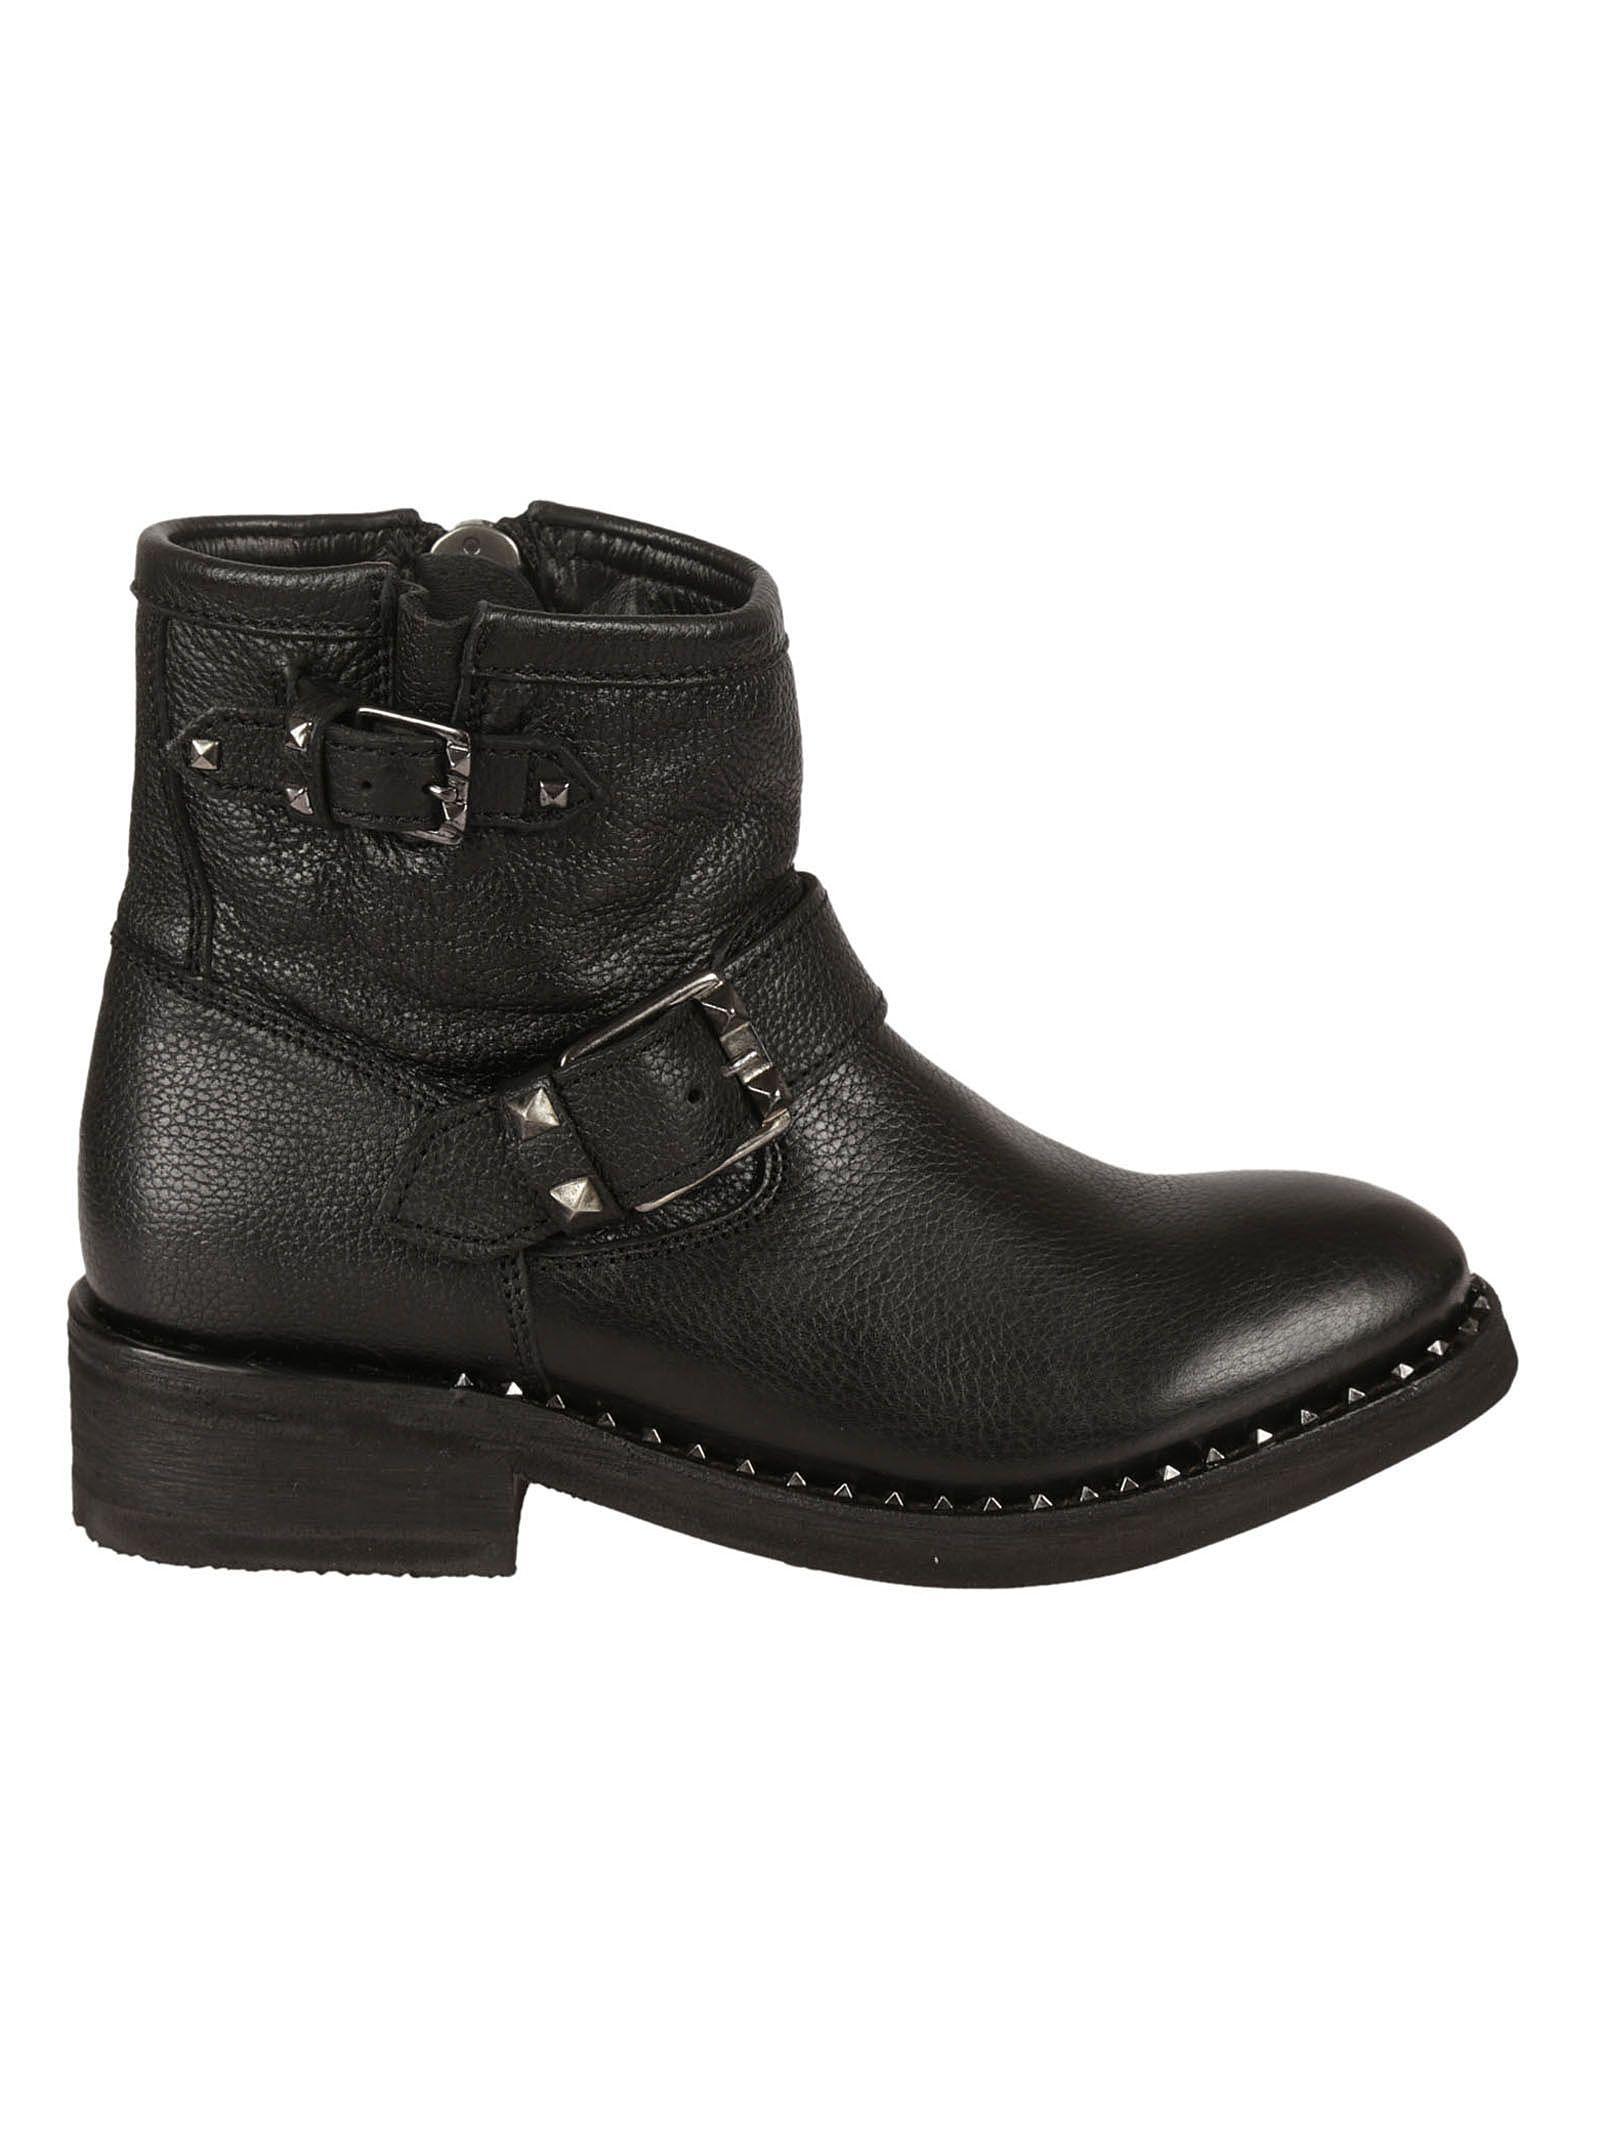 8a46d575459 Ash Black Speed Biker Boots - Black ...